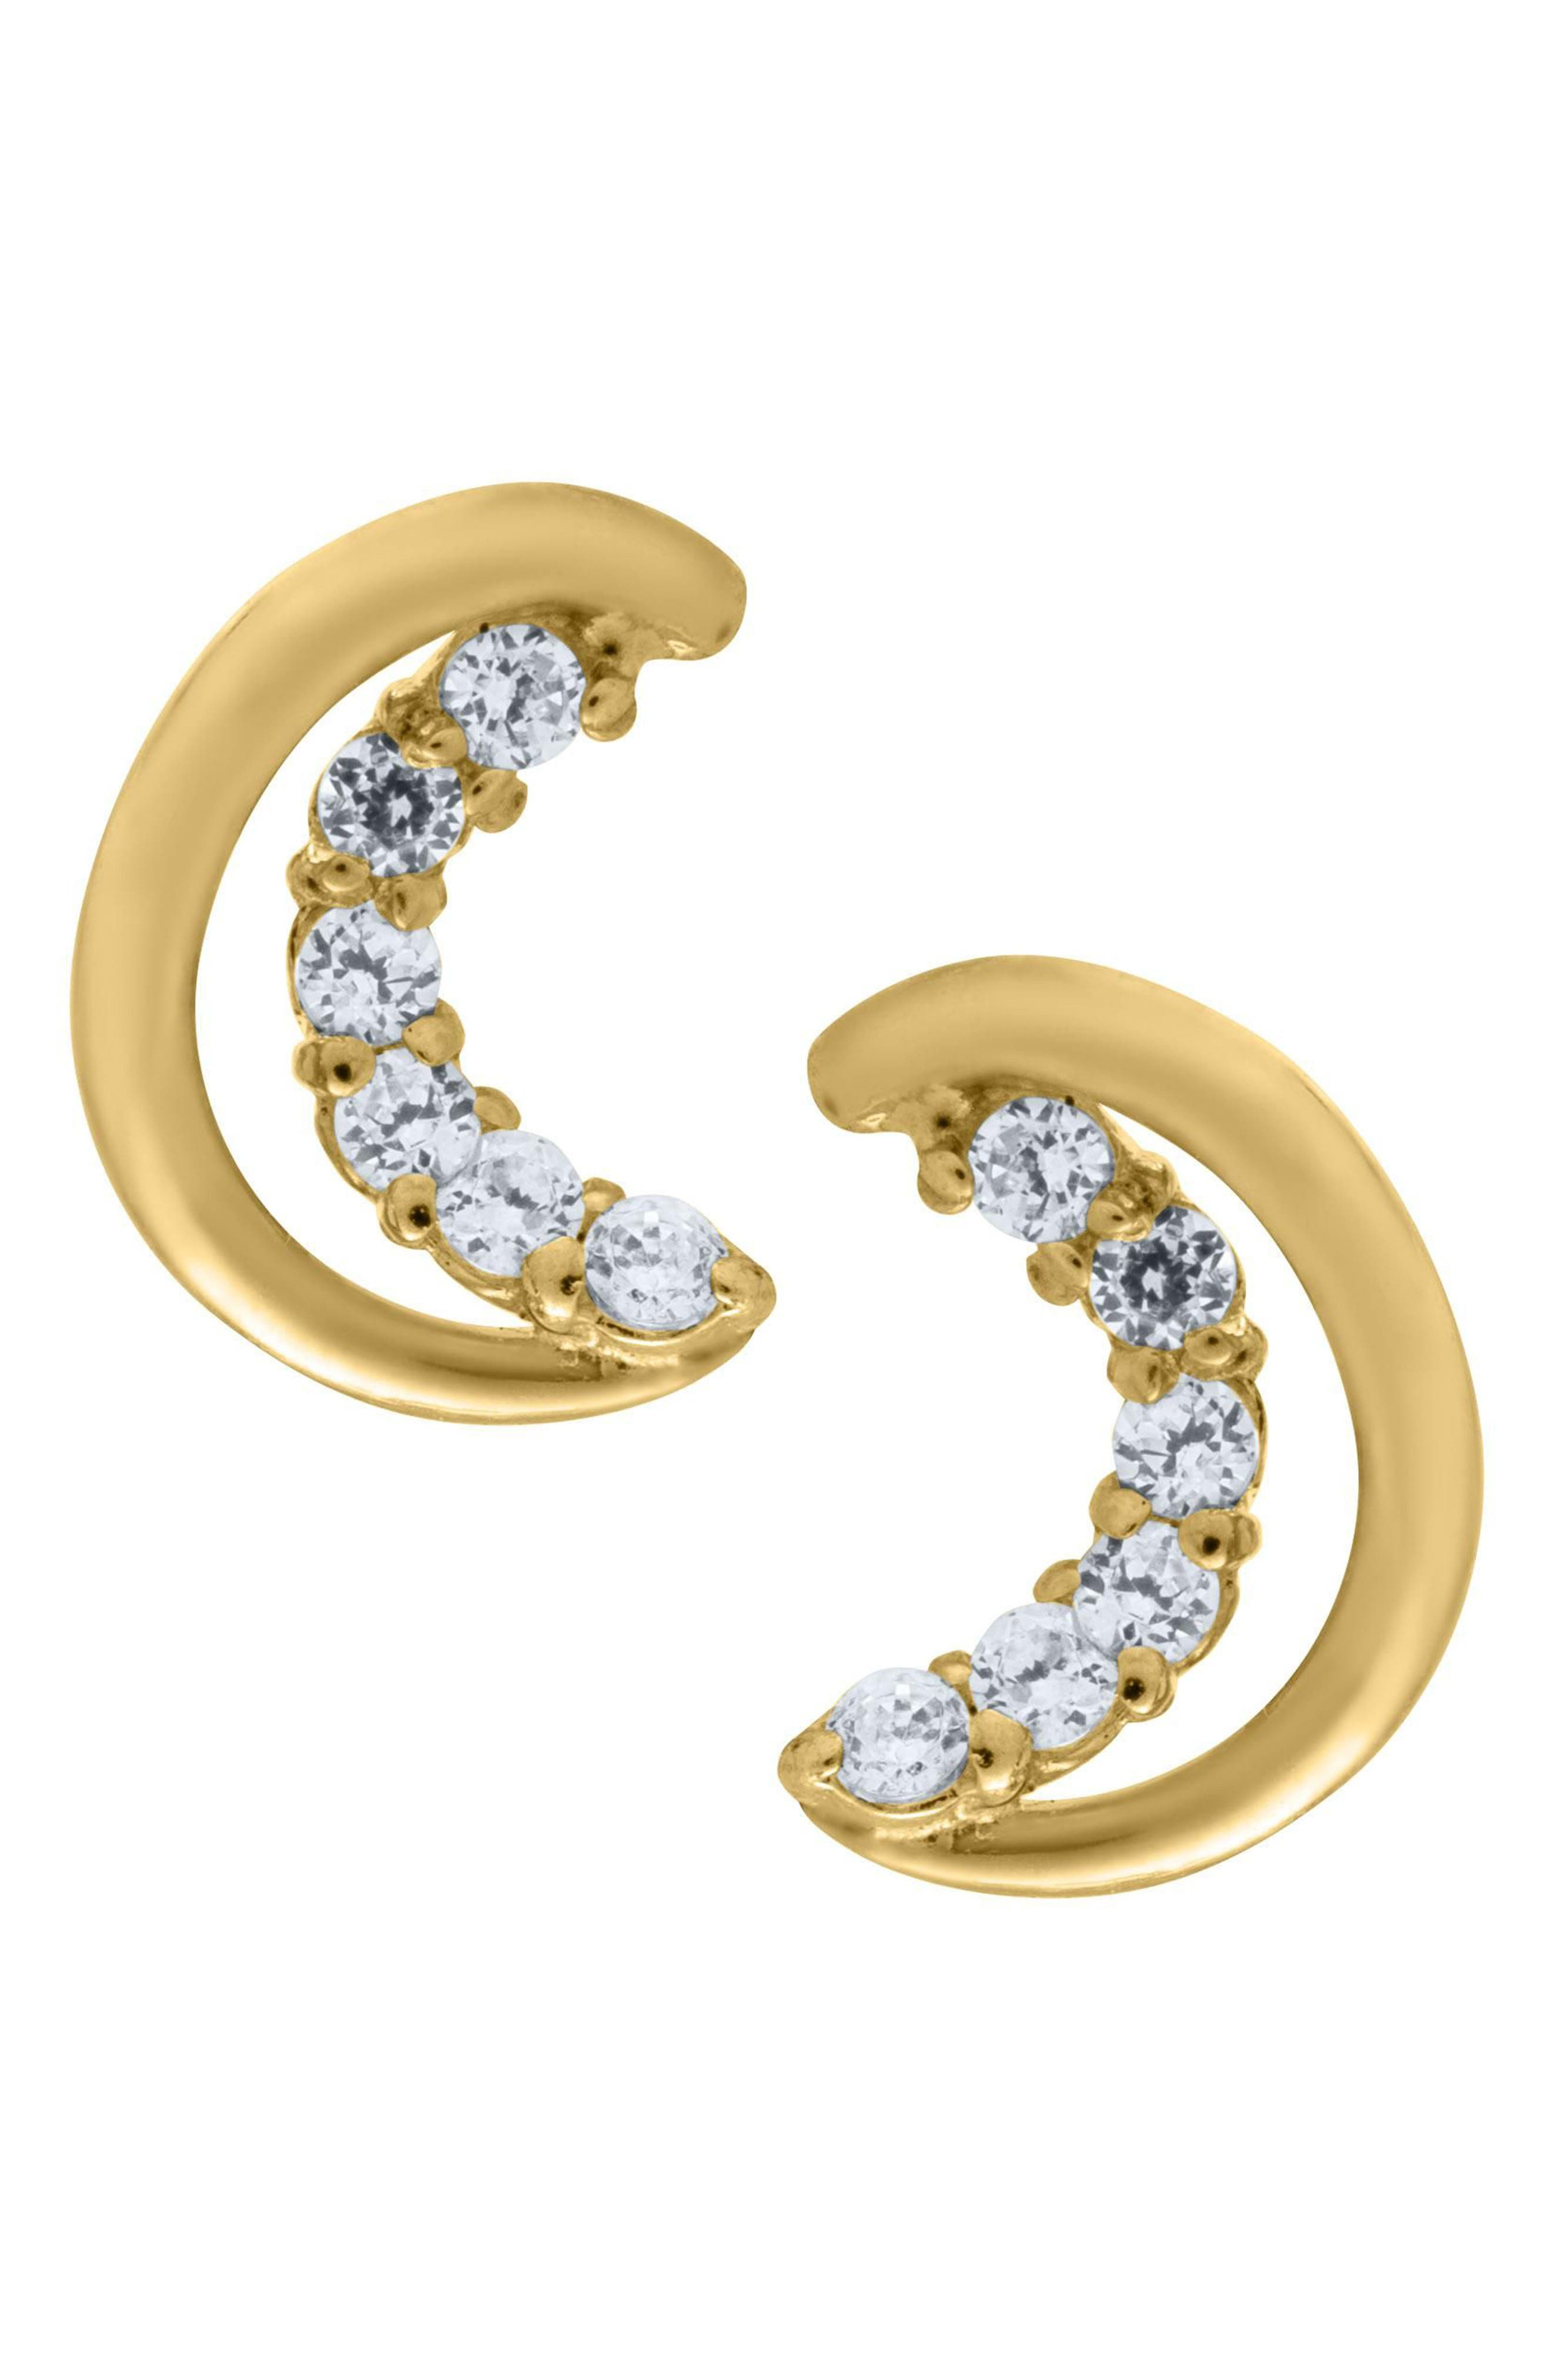 14k Gold Half Moon Earrings,                         Main,                         color, Gold